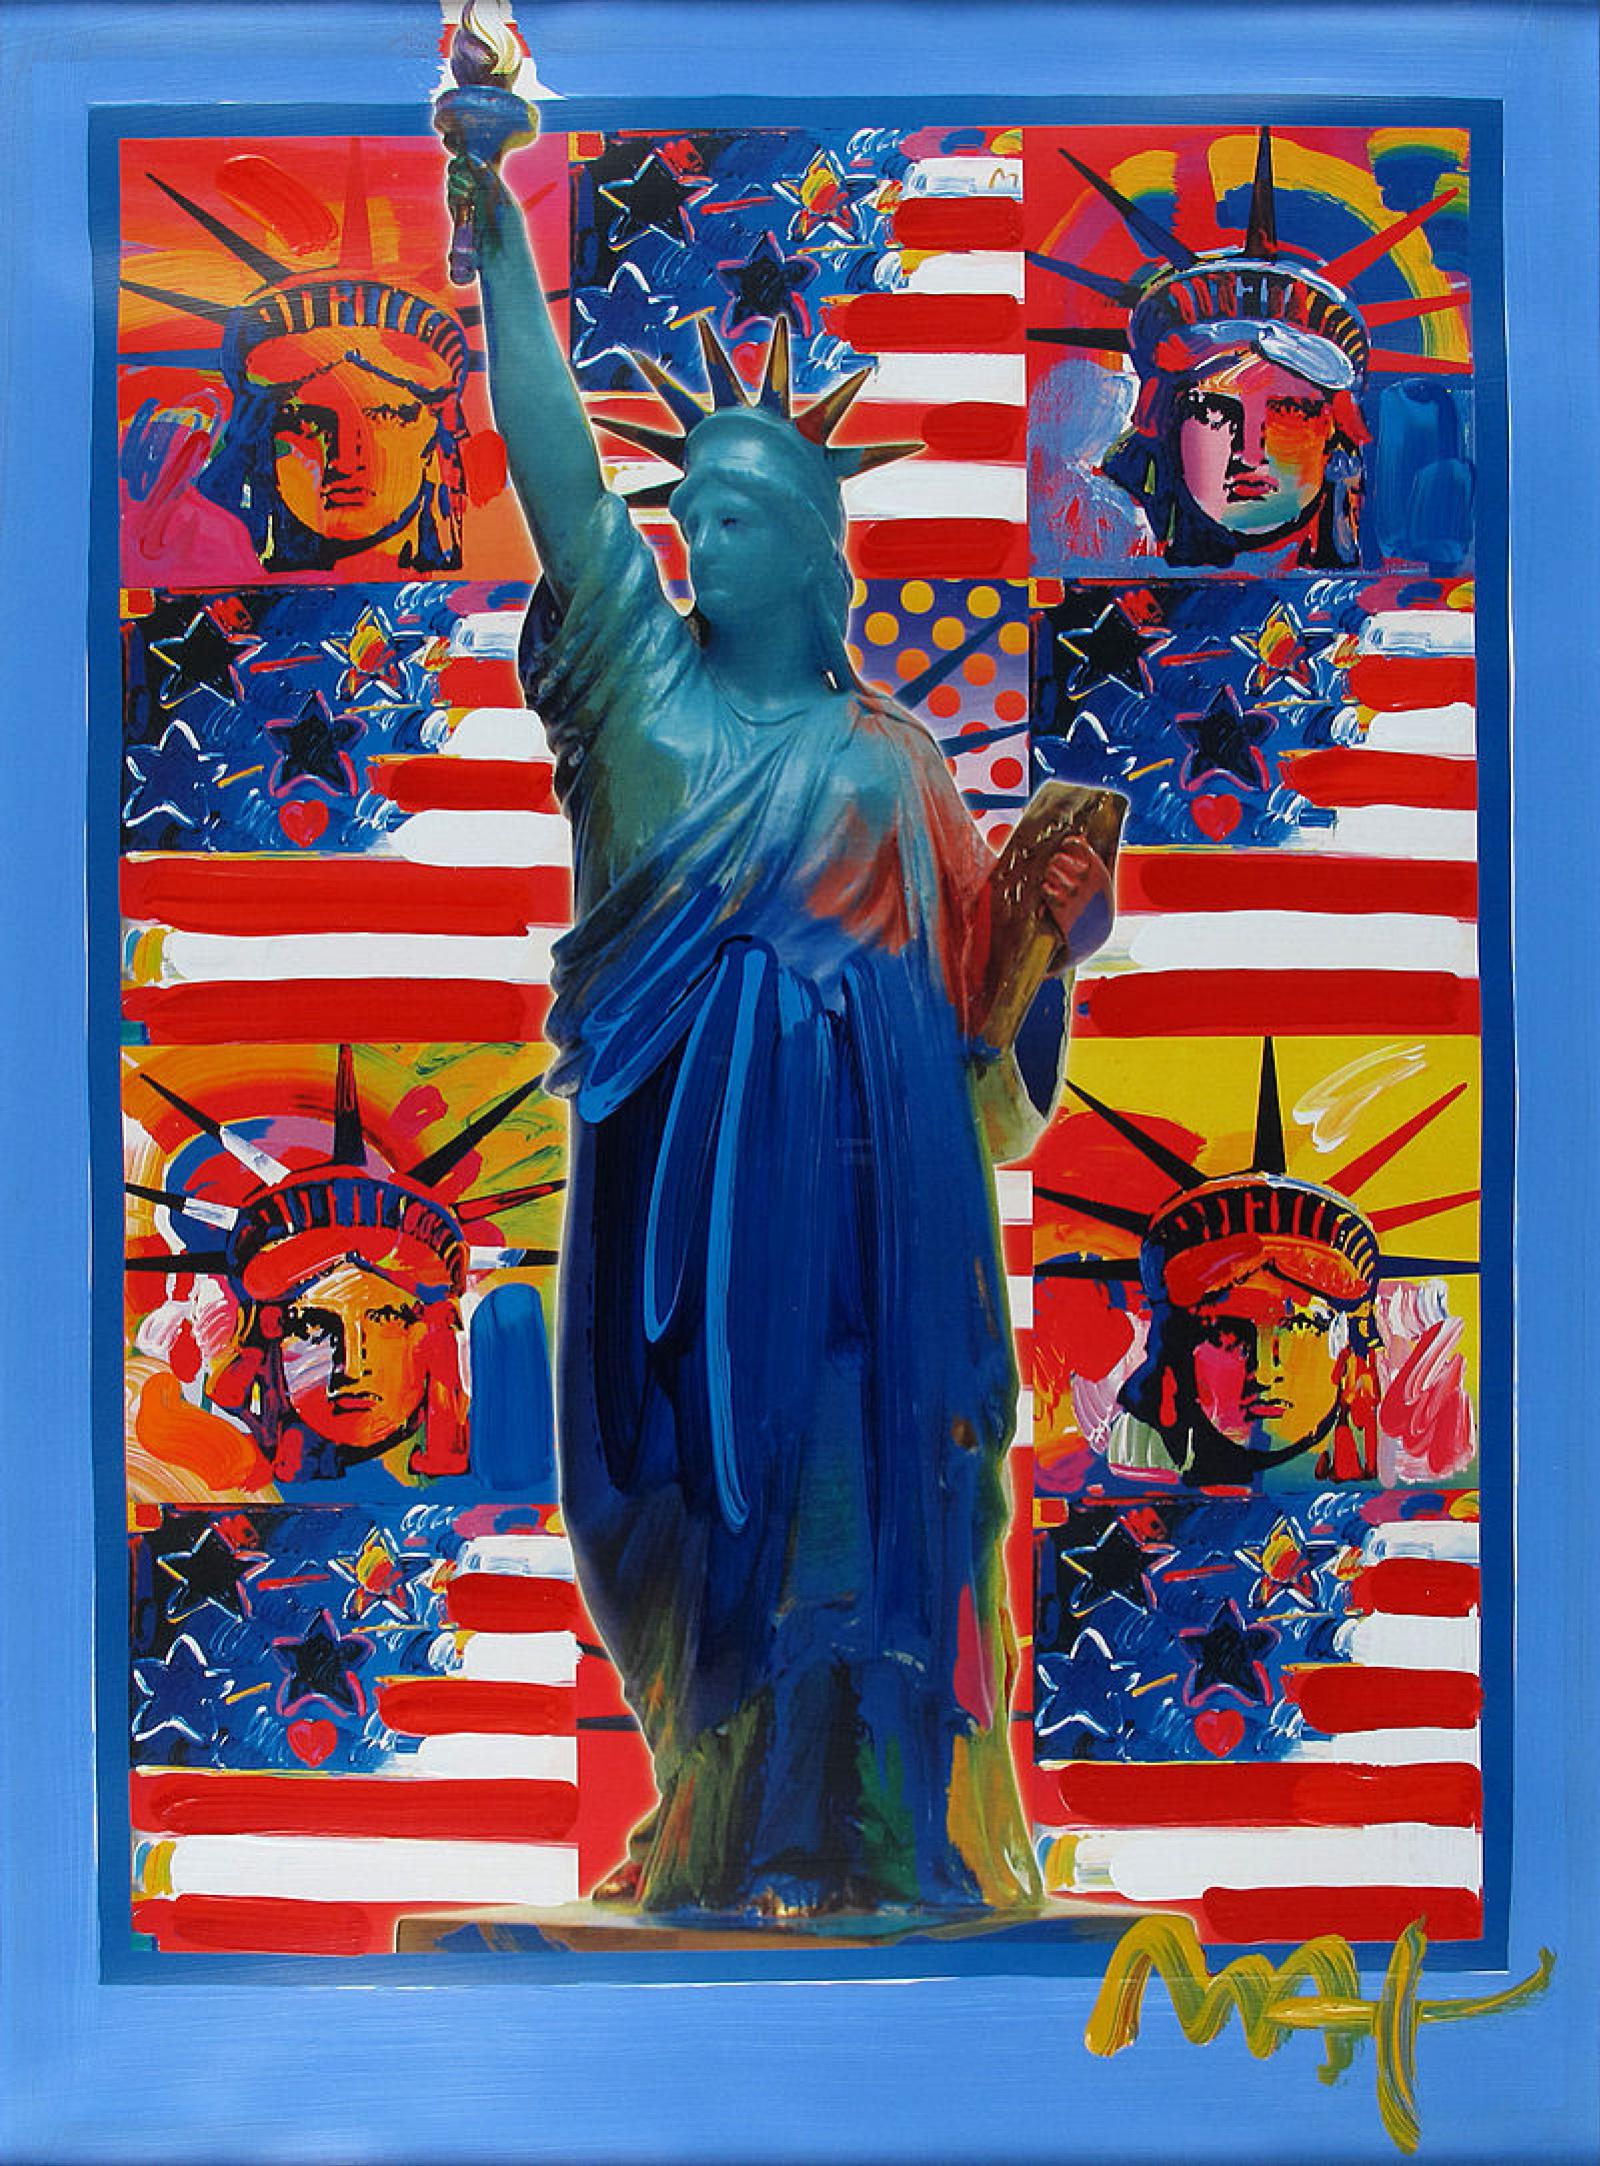 Питер  Макс. Бог благословил Америку пятью свободами